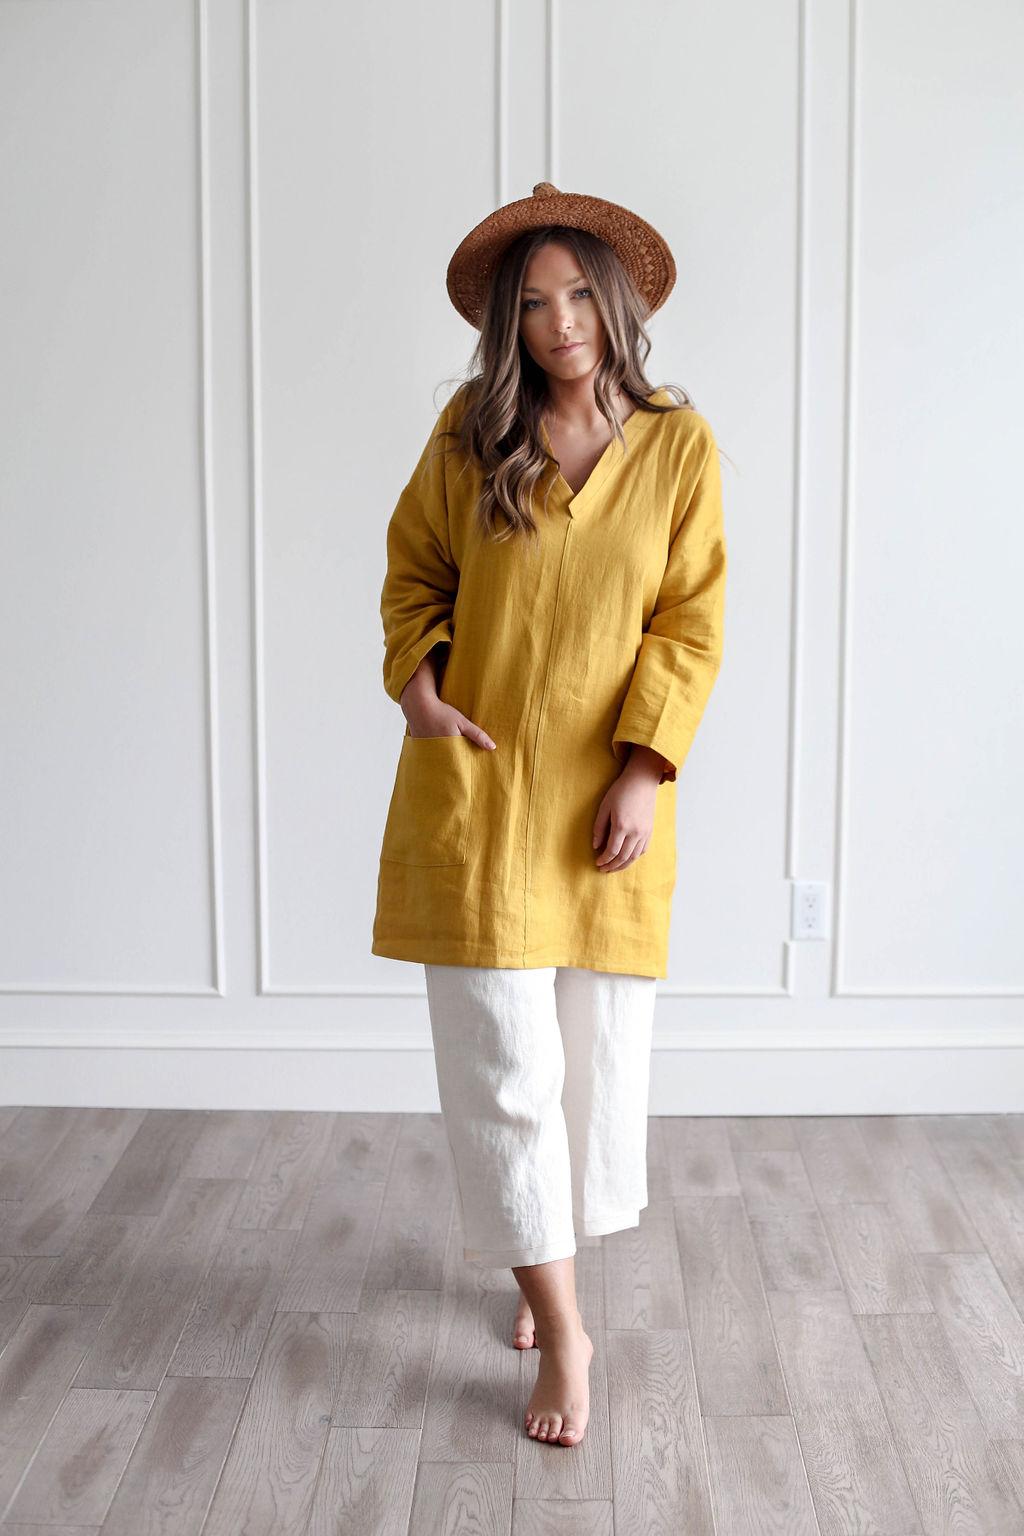 Nomi Designs | Linen Tunic in Cheddar over linen pants.jpg